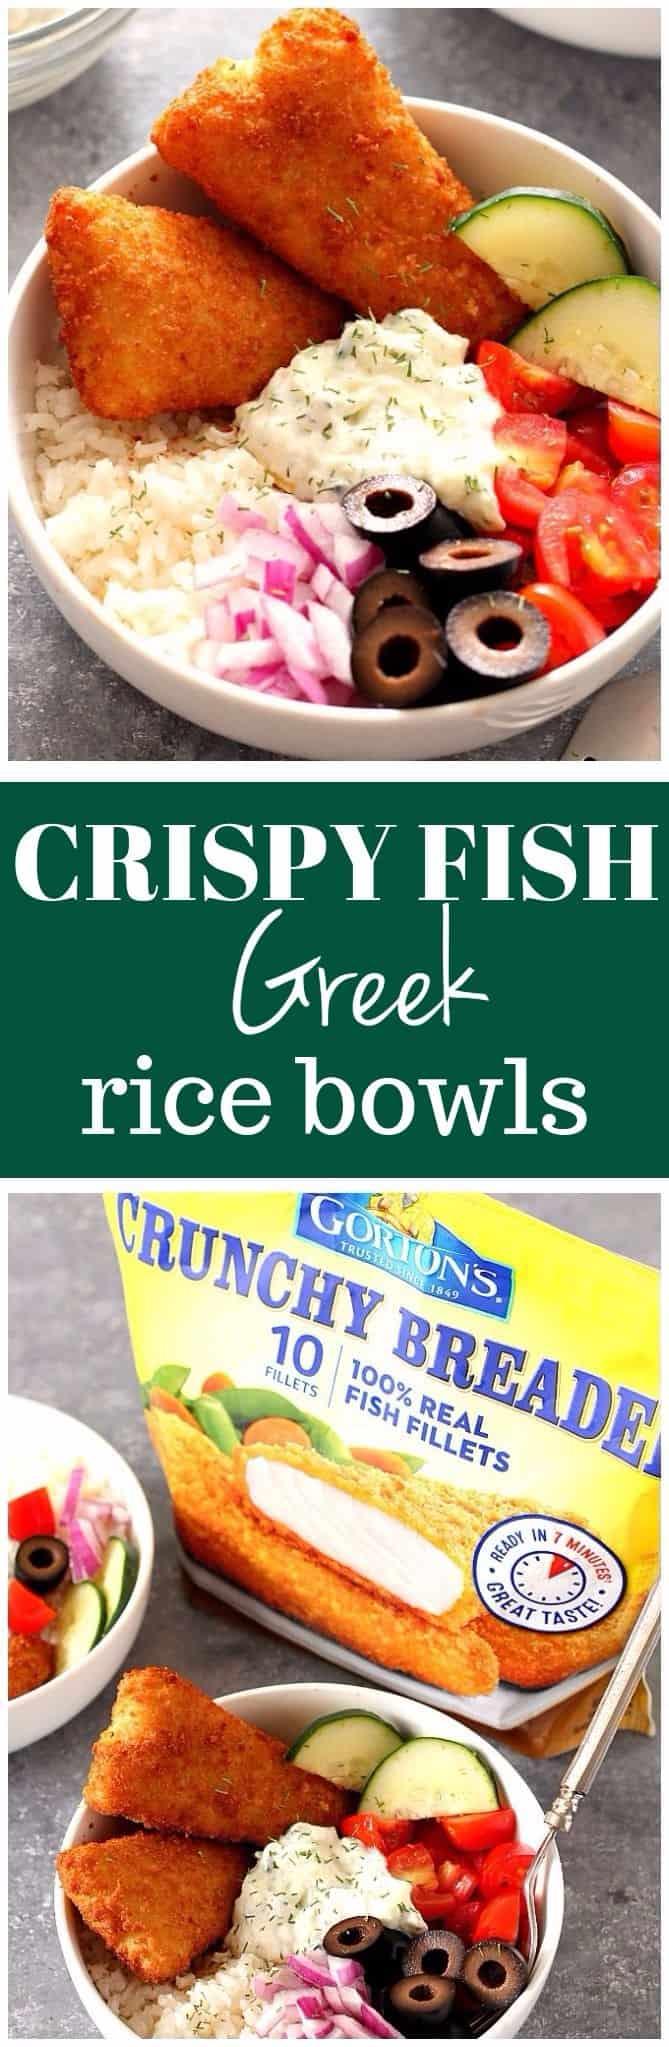 crispy fish Greek rice bowls recipe long1 Crispy Fish Greek Rice Bowls Recipe